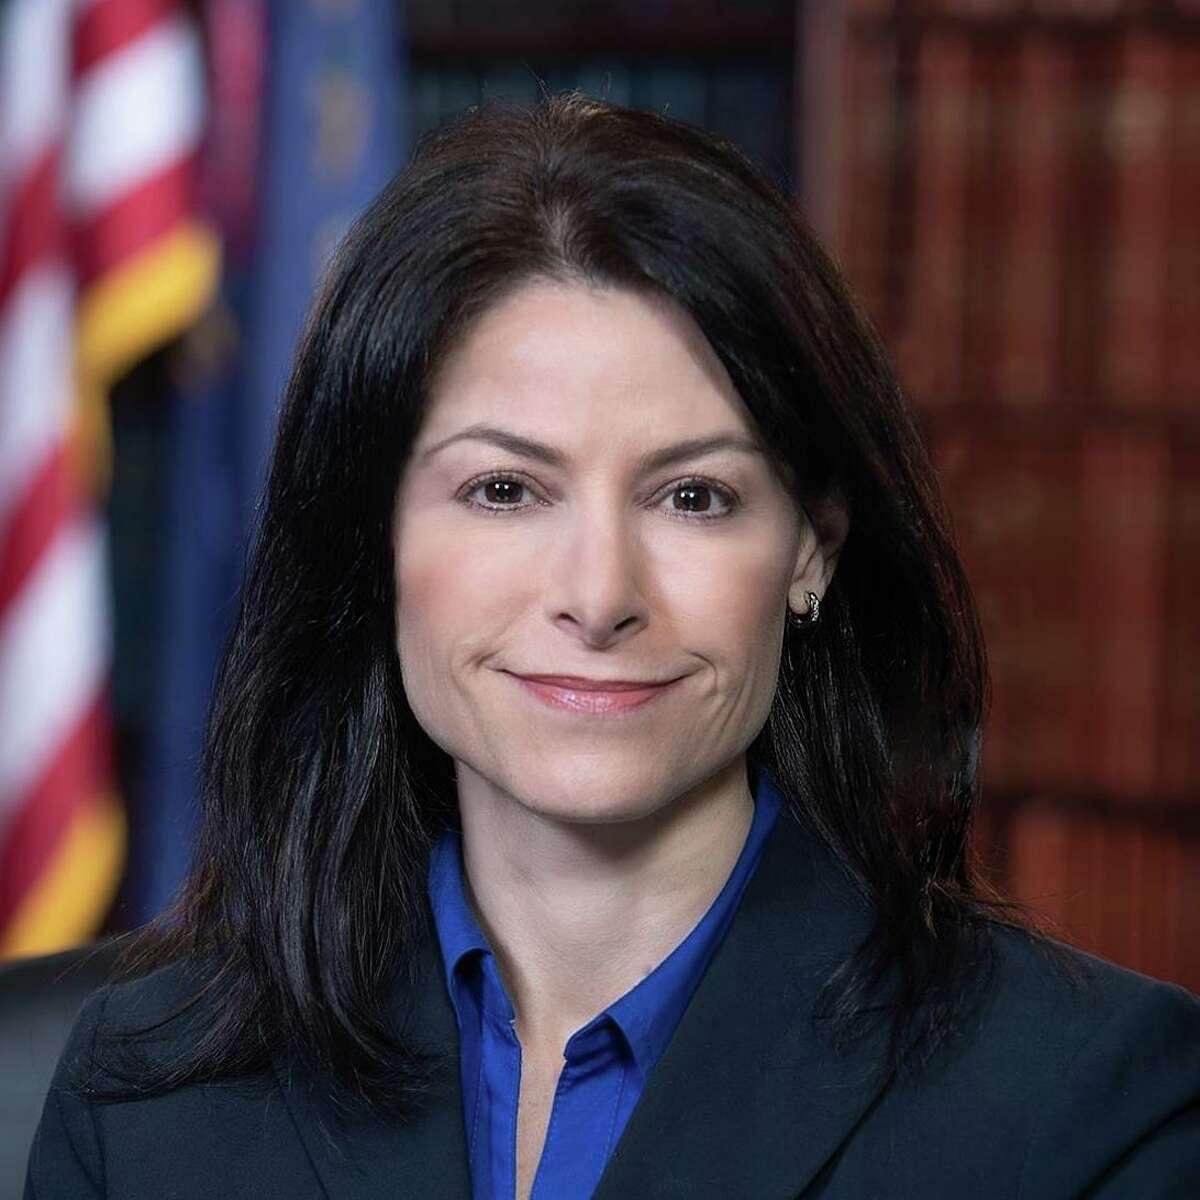 Michigan Attorney General Dana Nessel